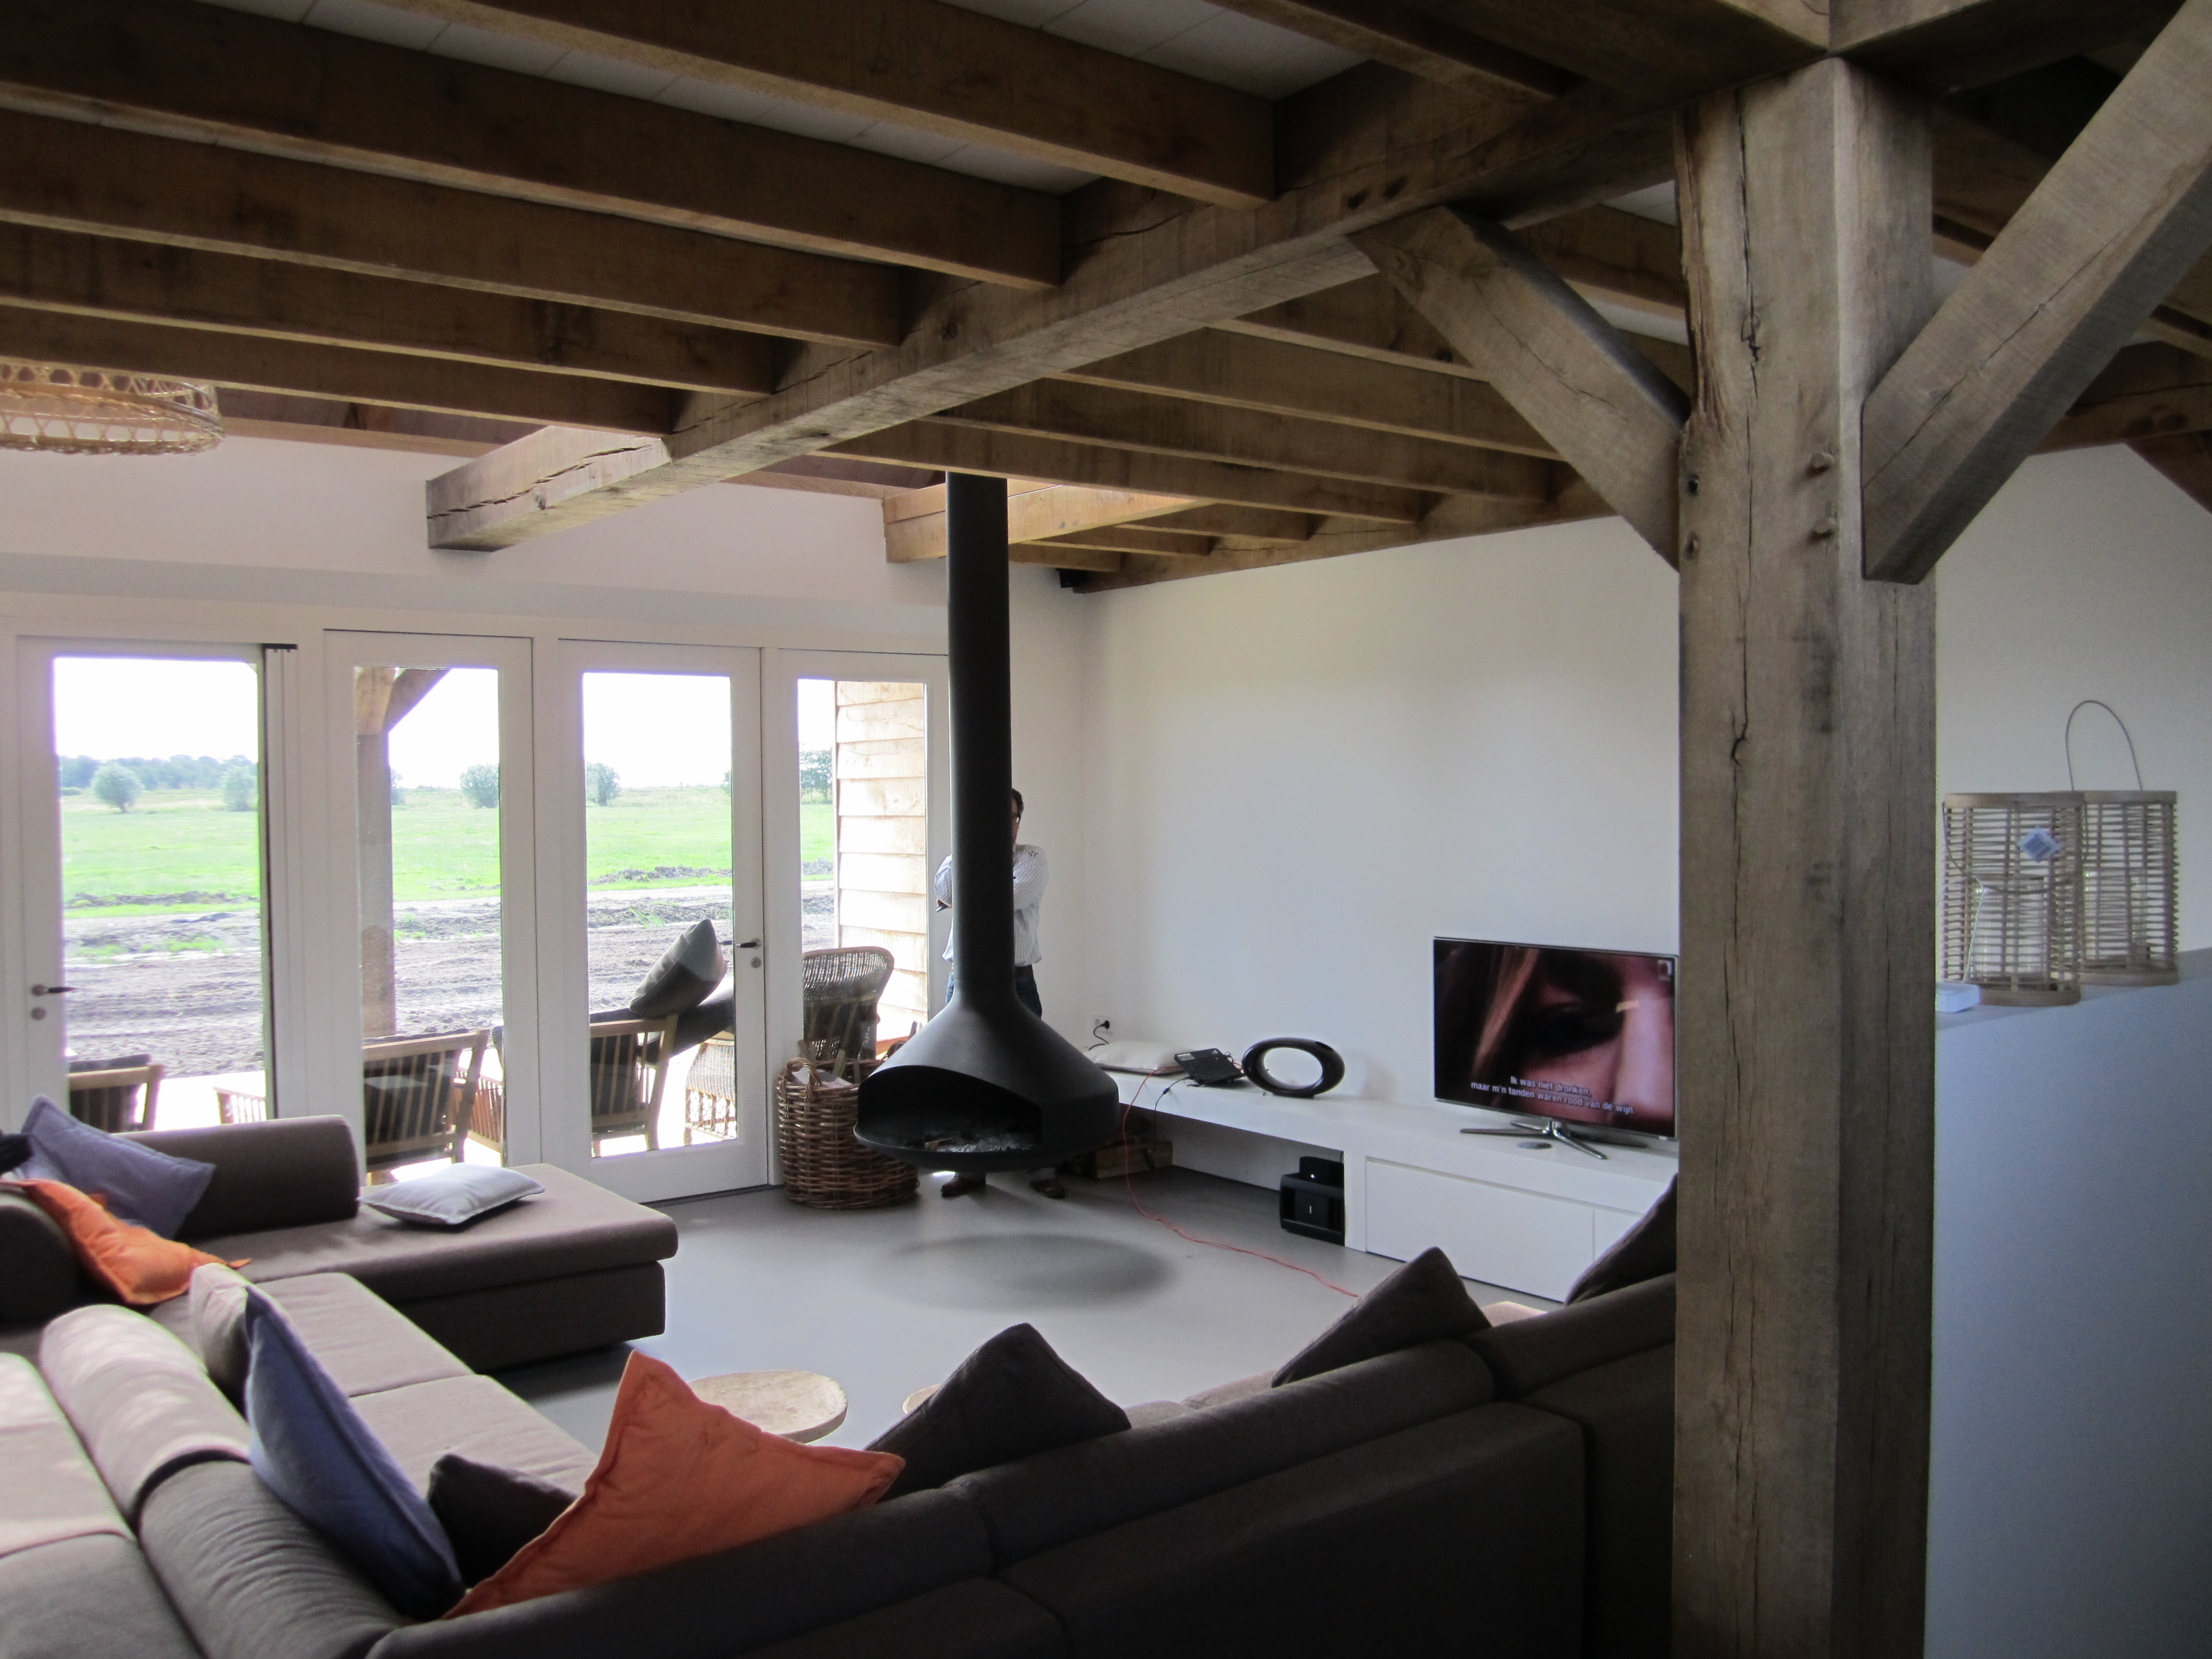 Woonkamer eiken badkamer plafond maken visgraat parket enkel gerookt wit geolied for Deco woonkamer moderne woonkamer